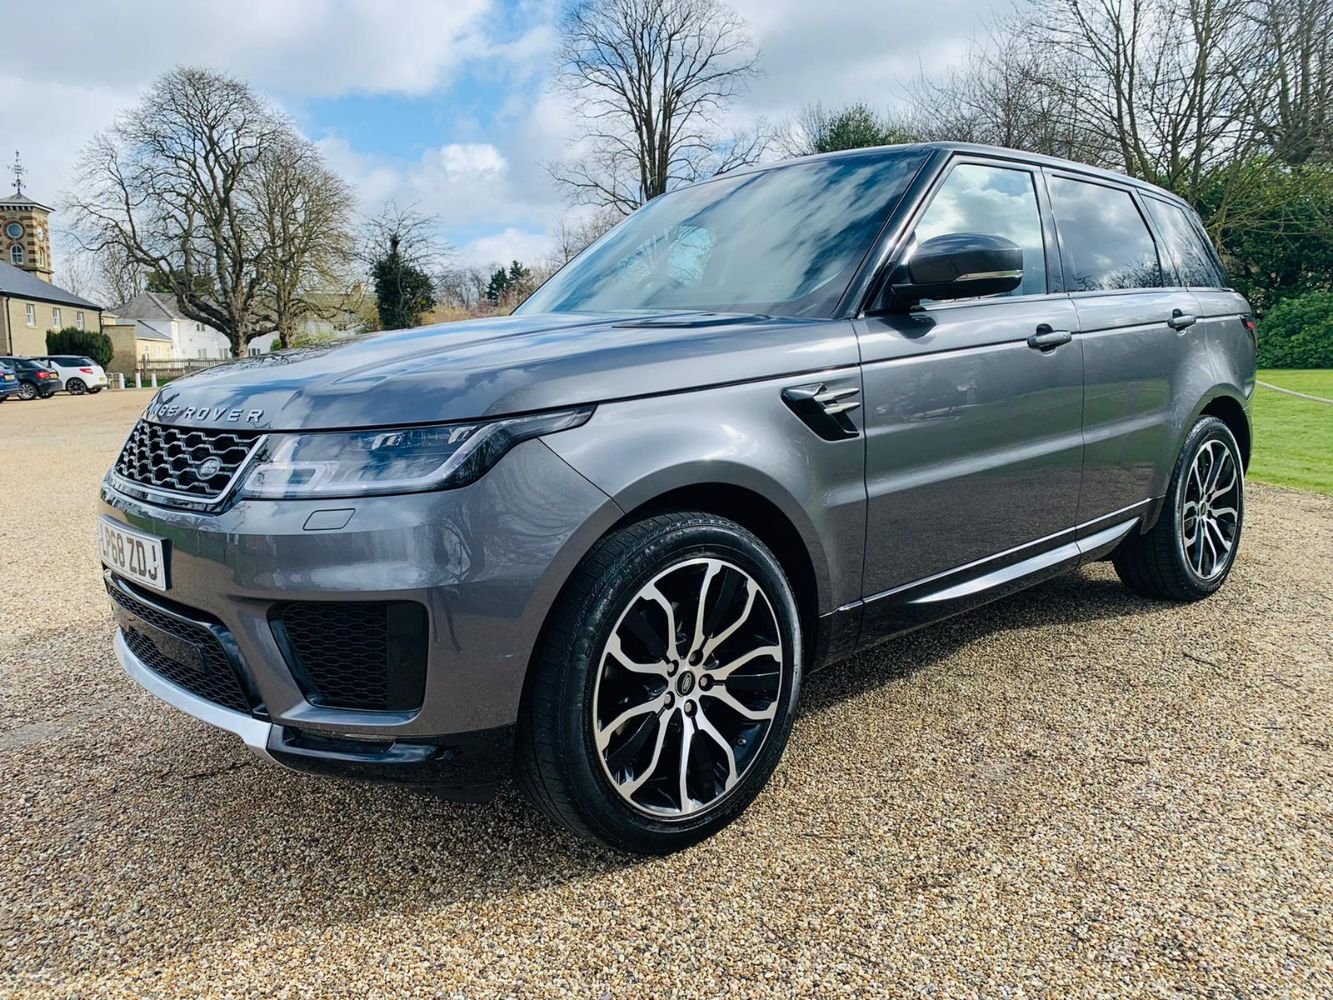 Range Rover Sport 3.0 SDV6 HSE Auto 2019 - Mercedes C300 AMG Line Premium Diesel/Electric Hybrid Estate Auto -Fleet Vehicle Disposal